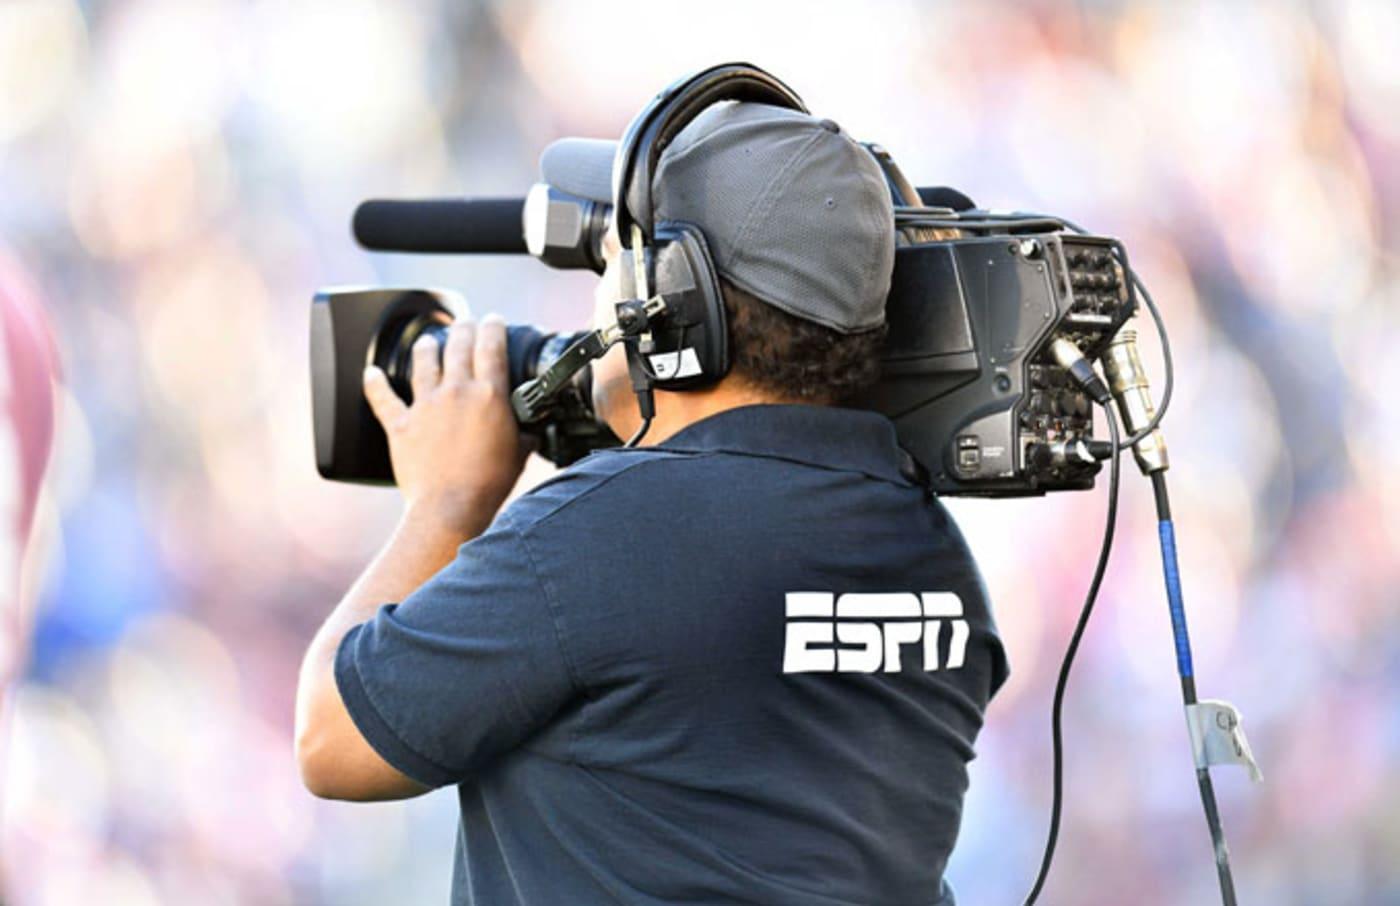 An ESPN camera guy